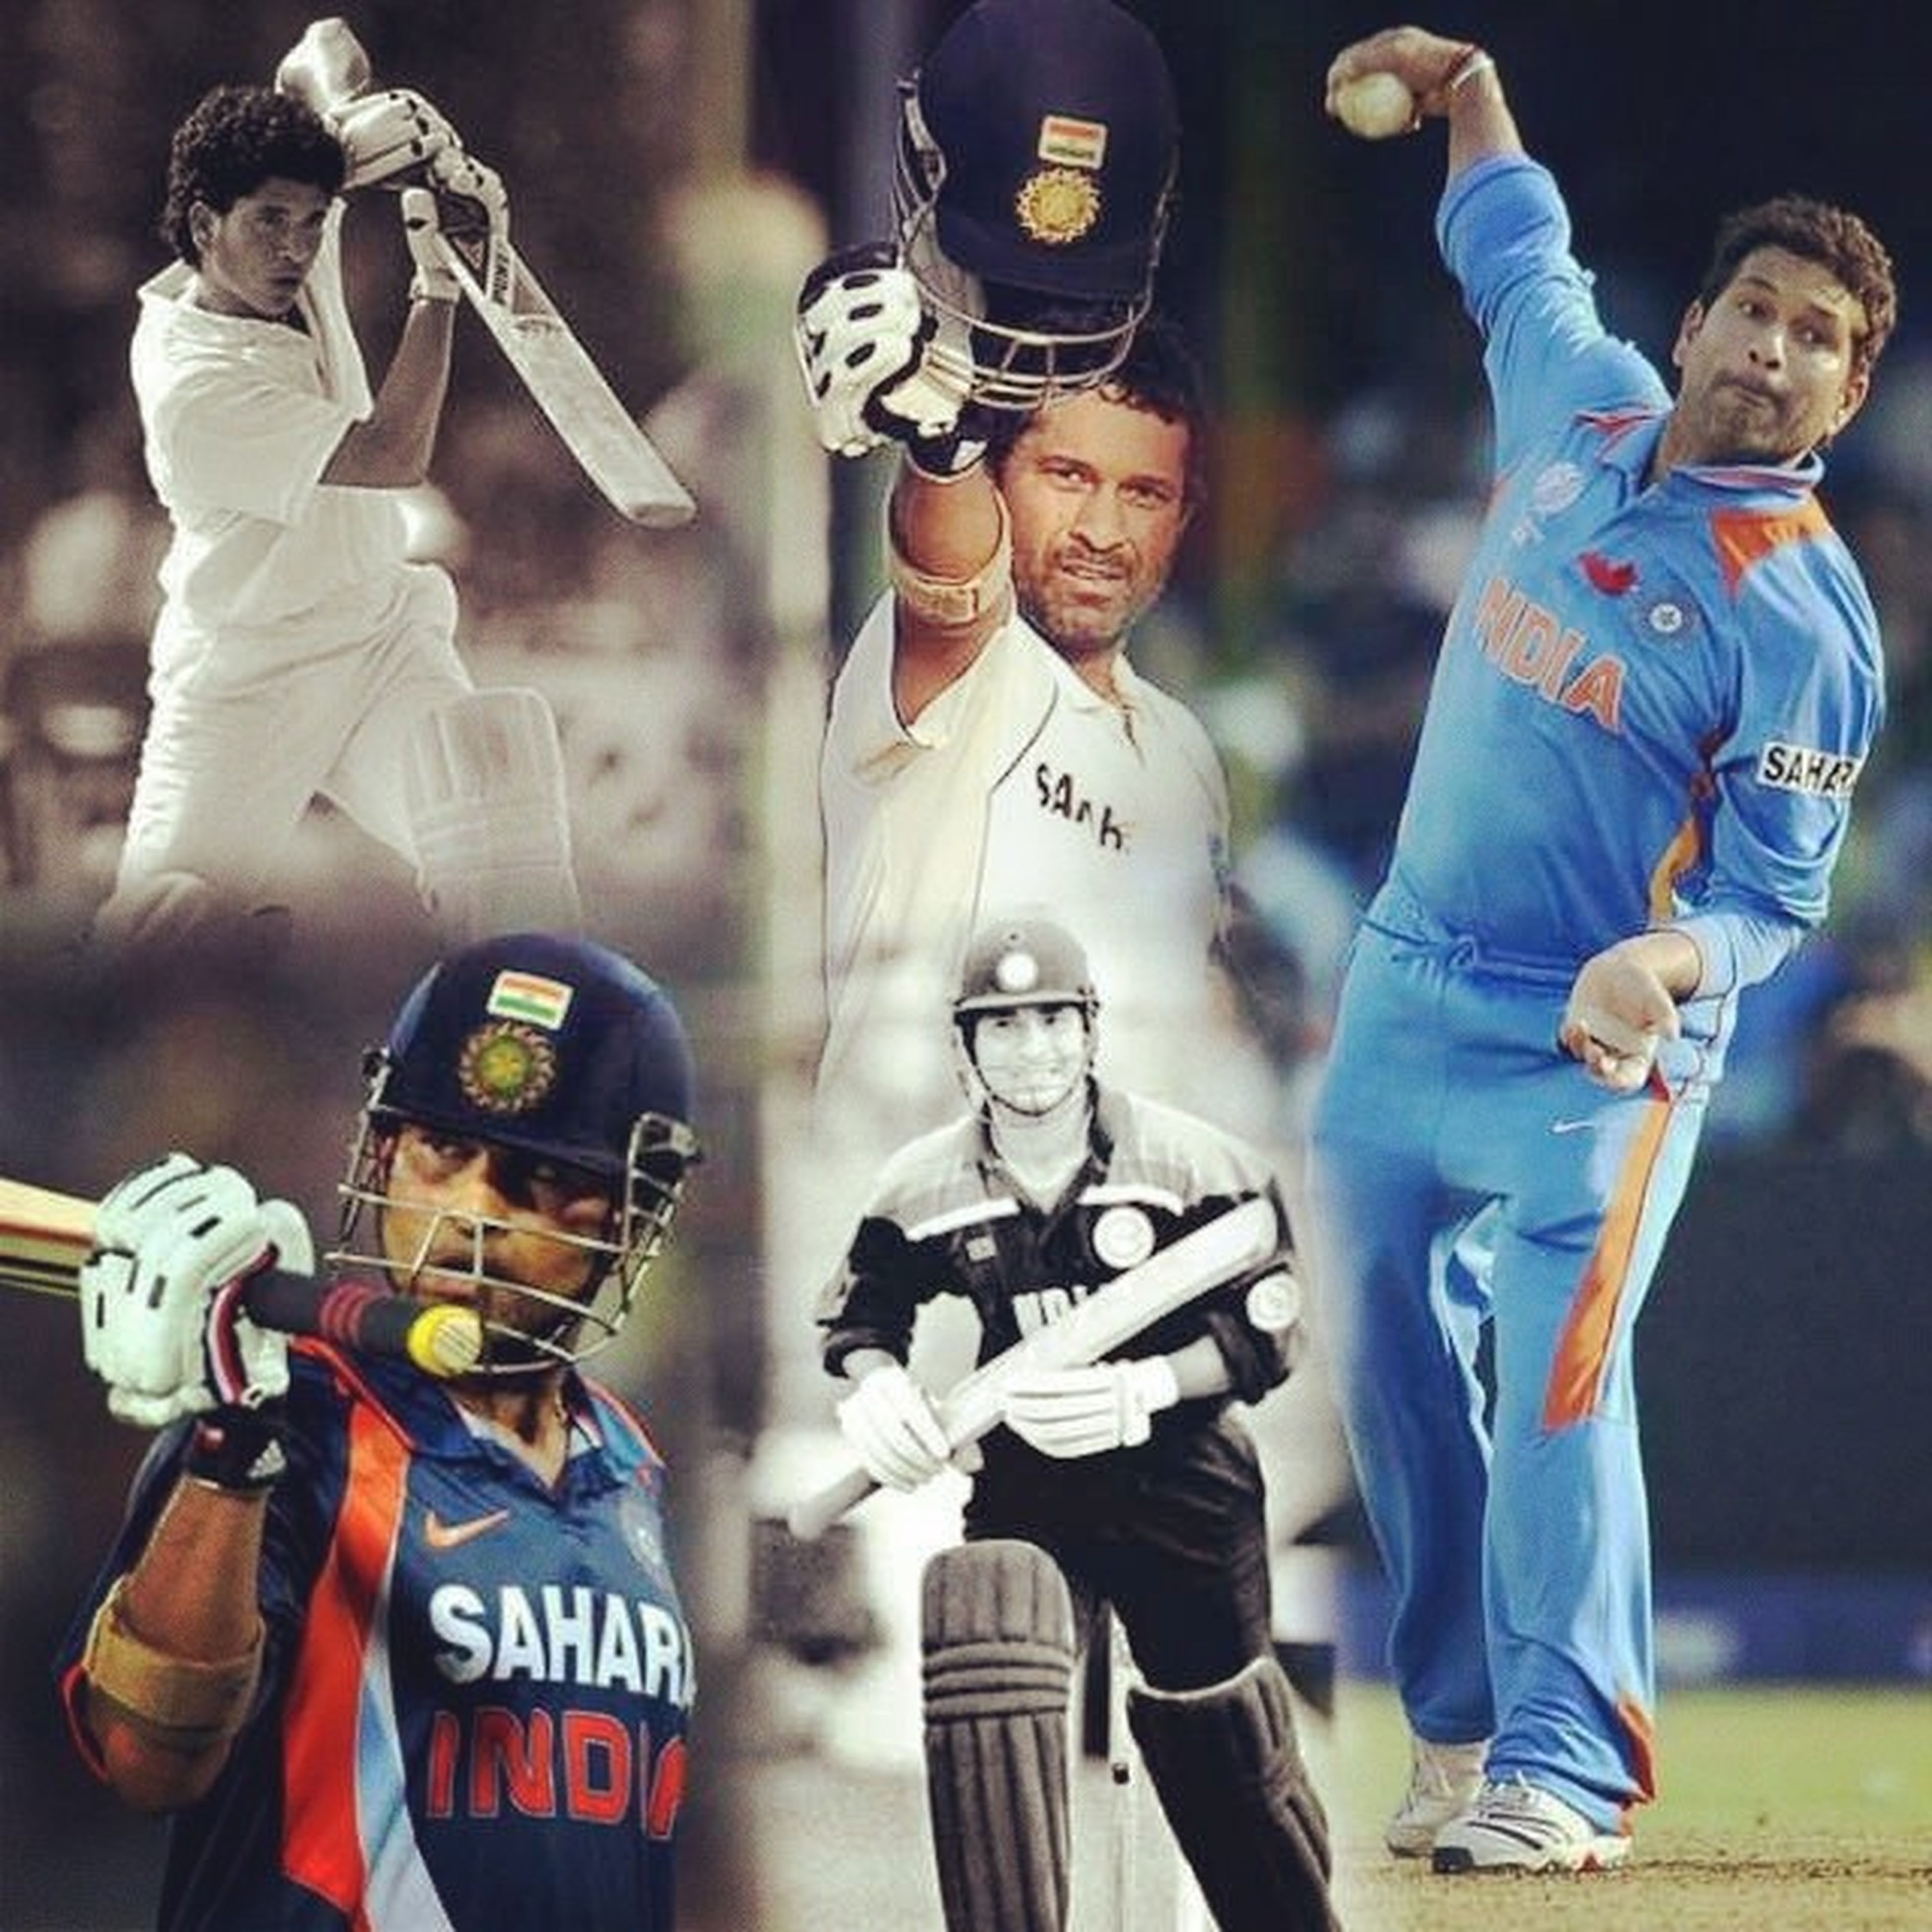 Happybdae SachinTendulkar God Cricket 100centuriesapril24worldcricketdaybleedblueinstaeditinstalikeigdailydoubletap